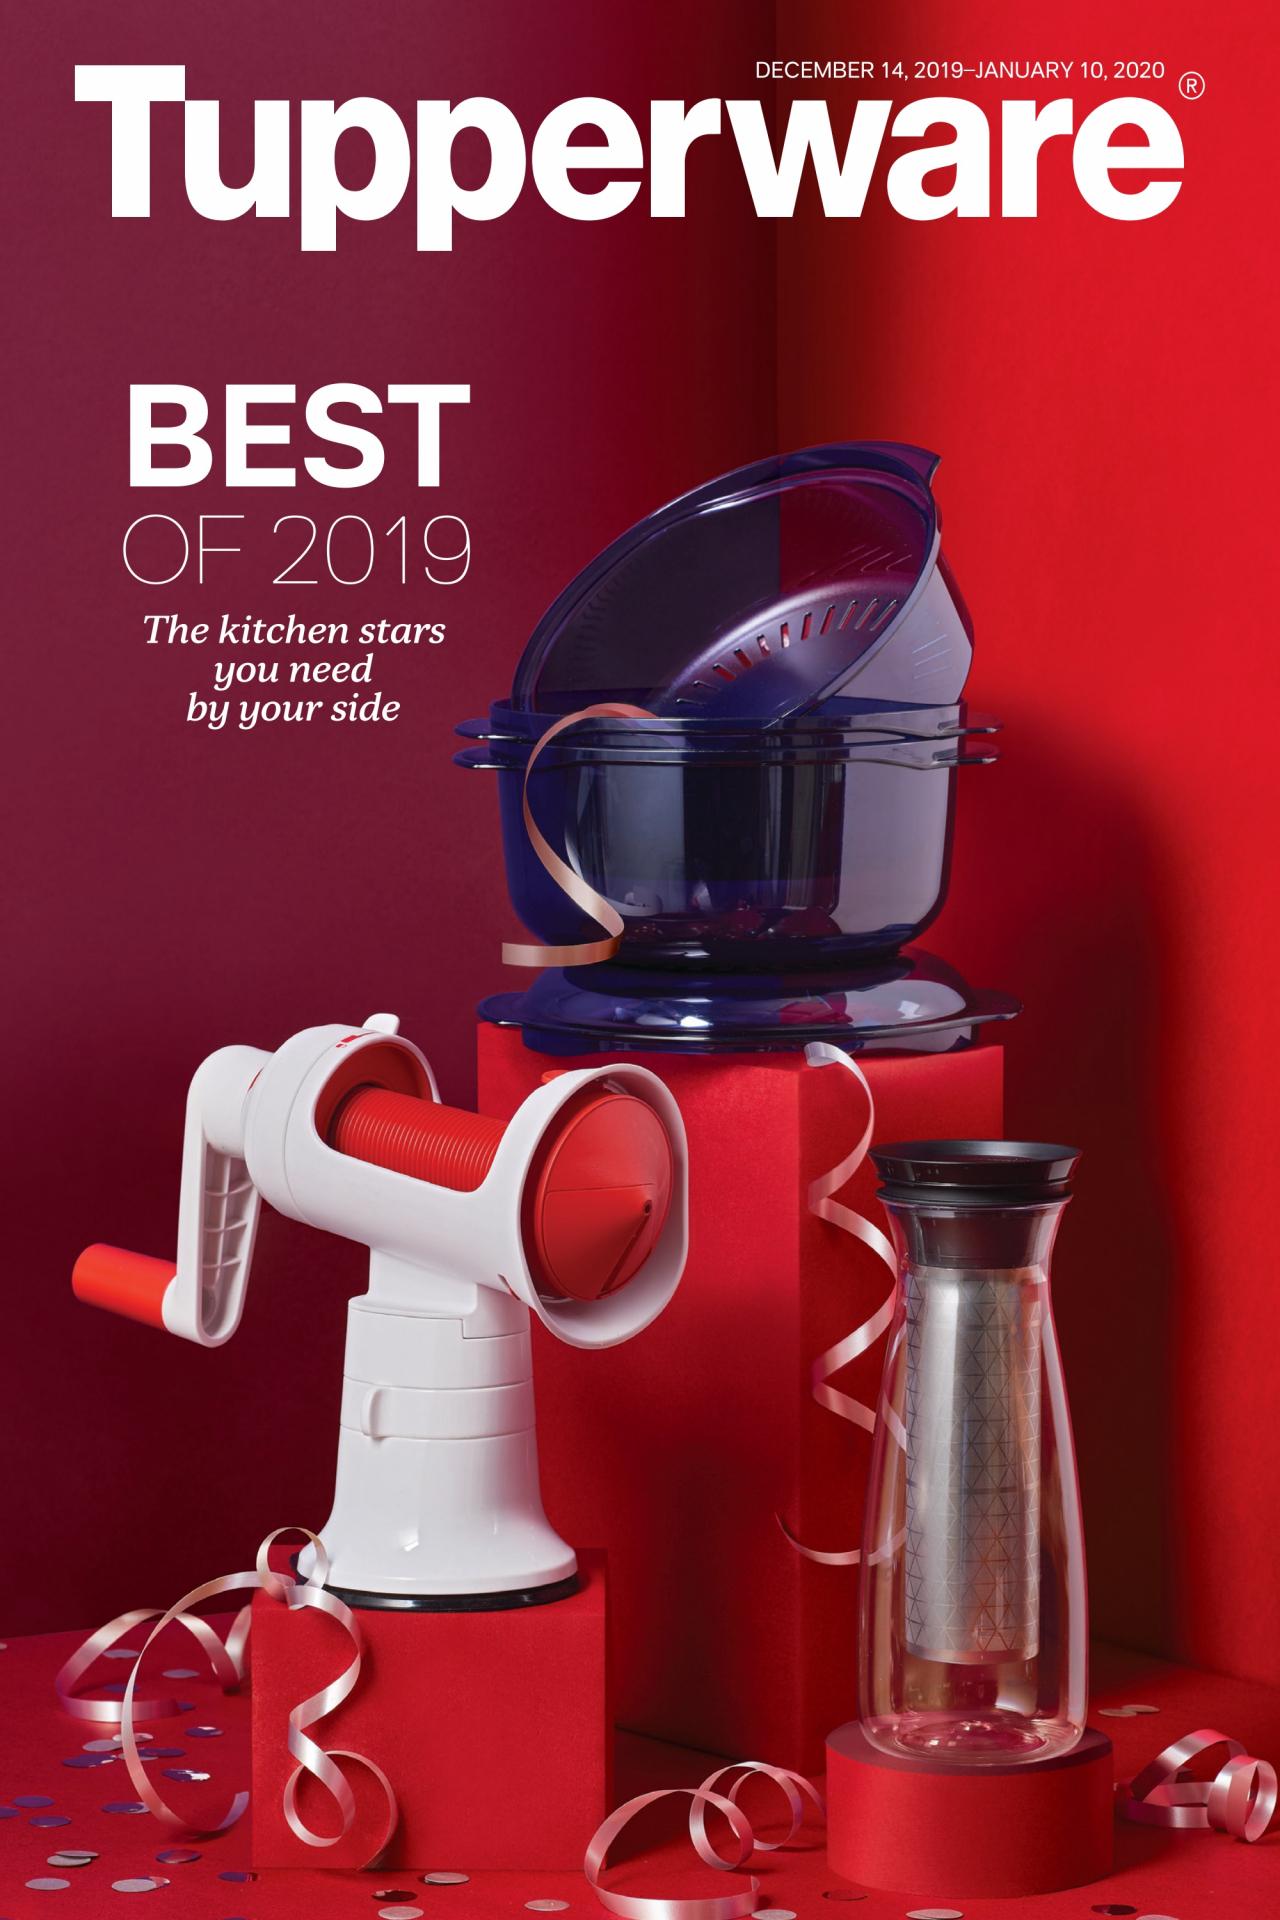 Tupperware Brochure – Valid Dec 14, 2019  Jan 10, 2020 with regard to Catalog Tupperware January 2020